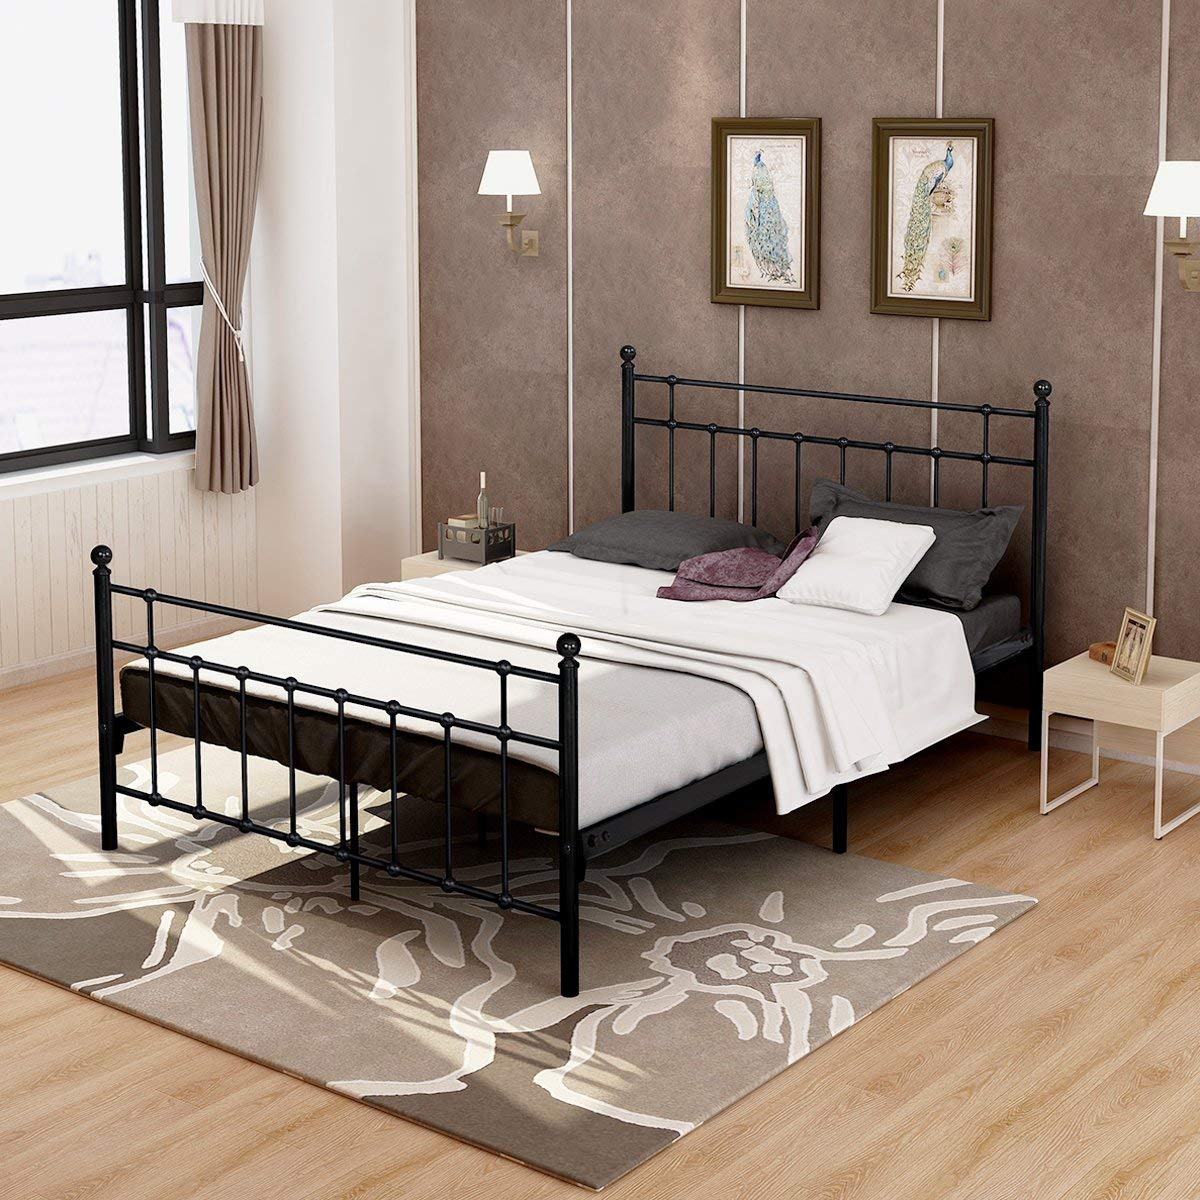 DUMEE  Queen Size Metal Platform Bed Frame WTH Headboard Footboard Steel Round Slat Mattress Foundation Black